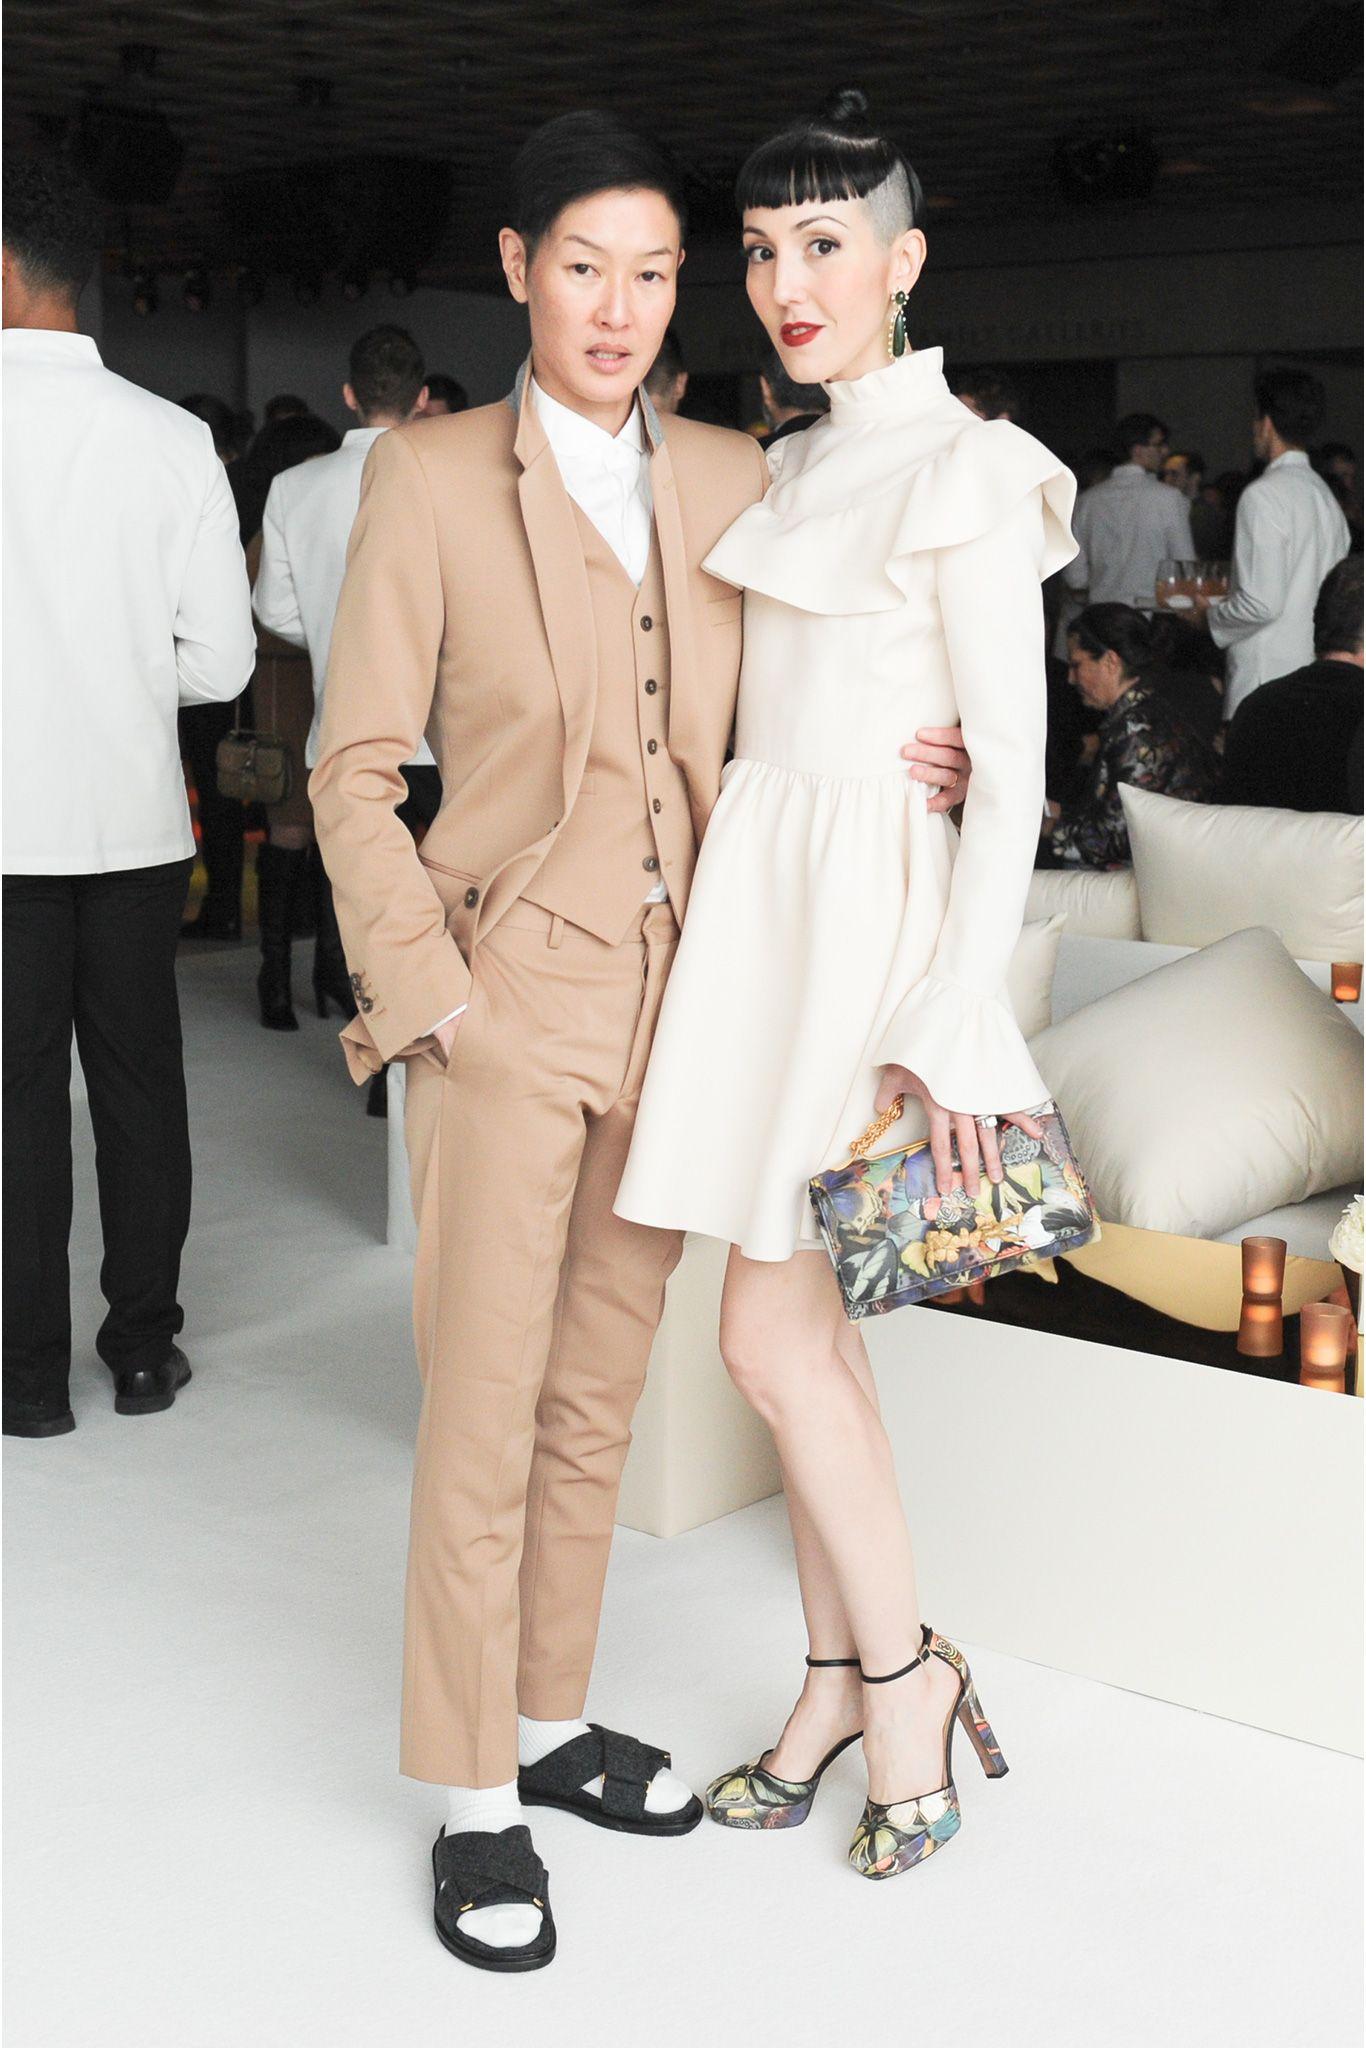 Exclusive Interview: Supermodel Jenny Shimizu